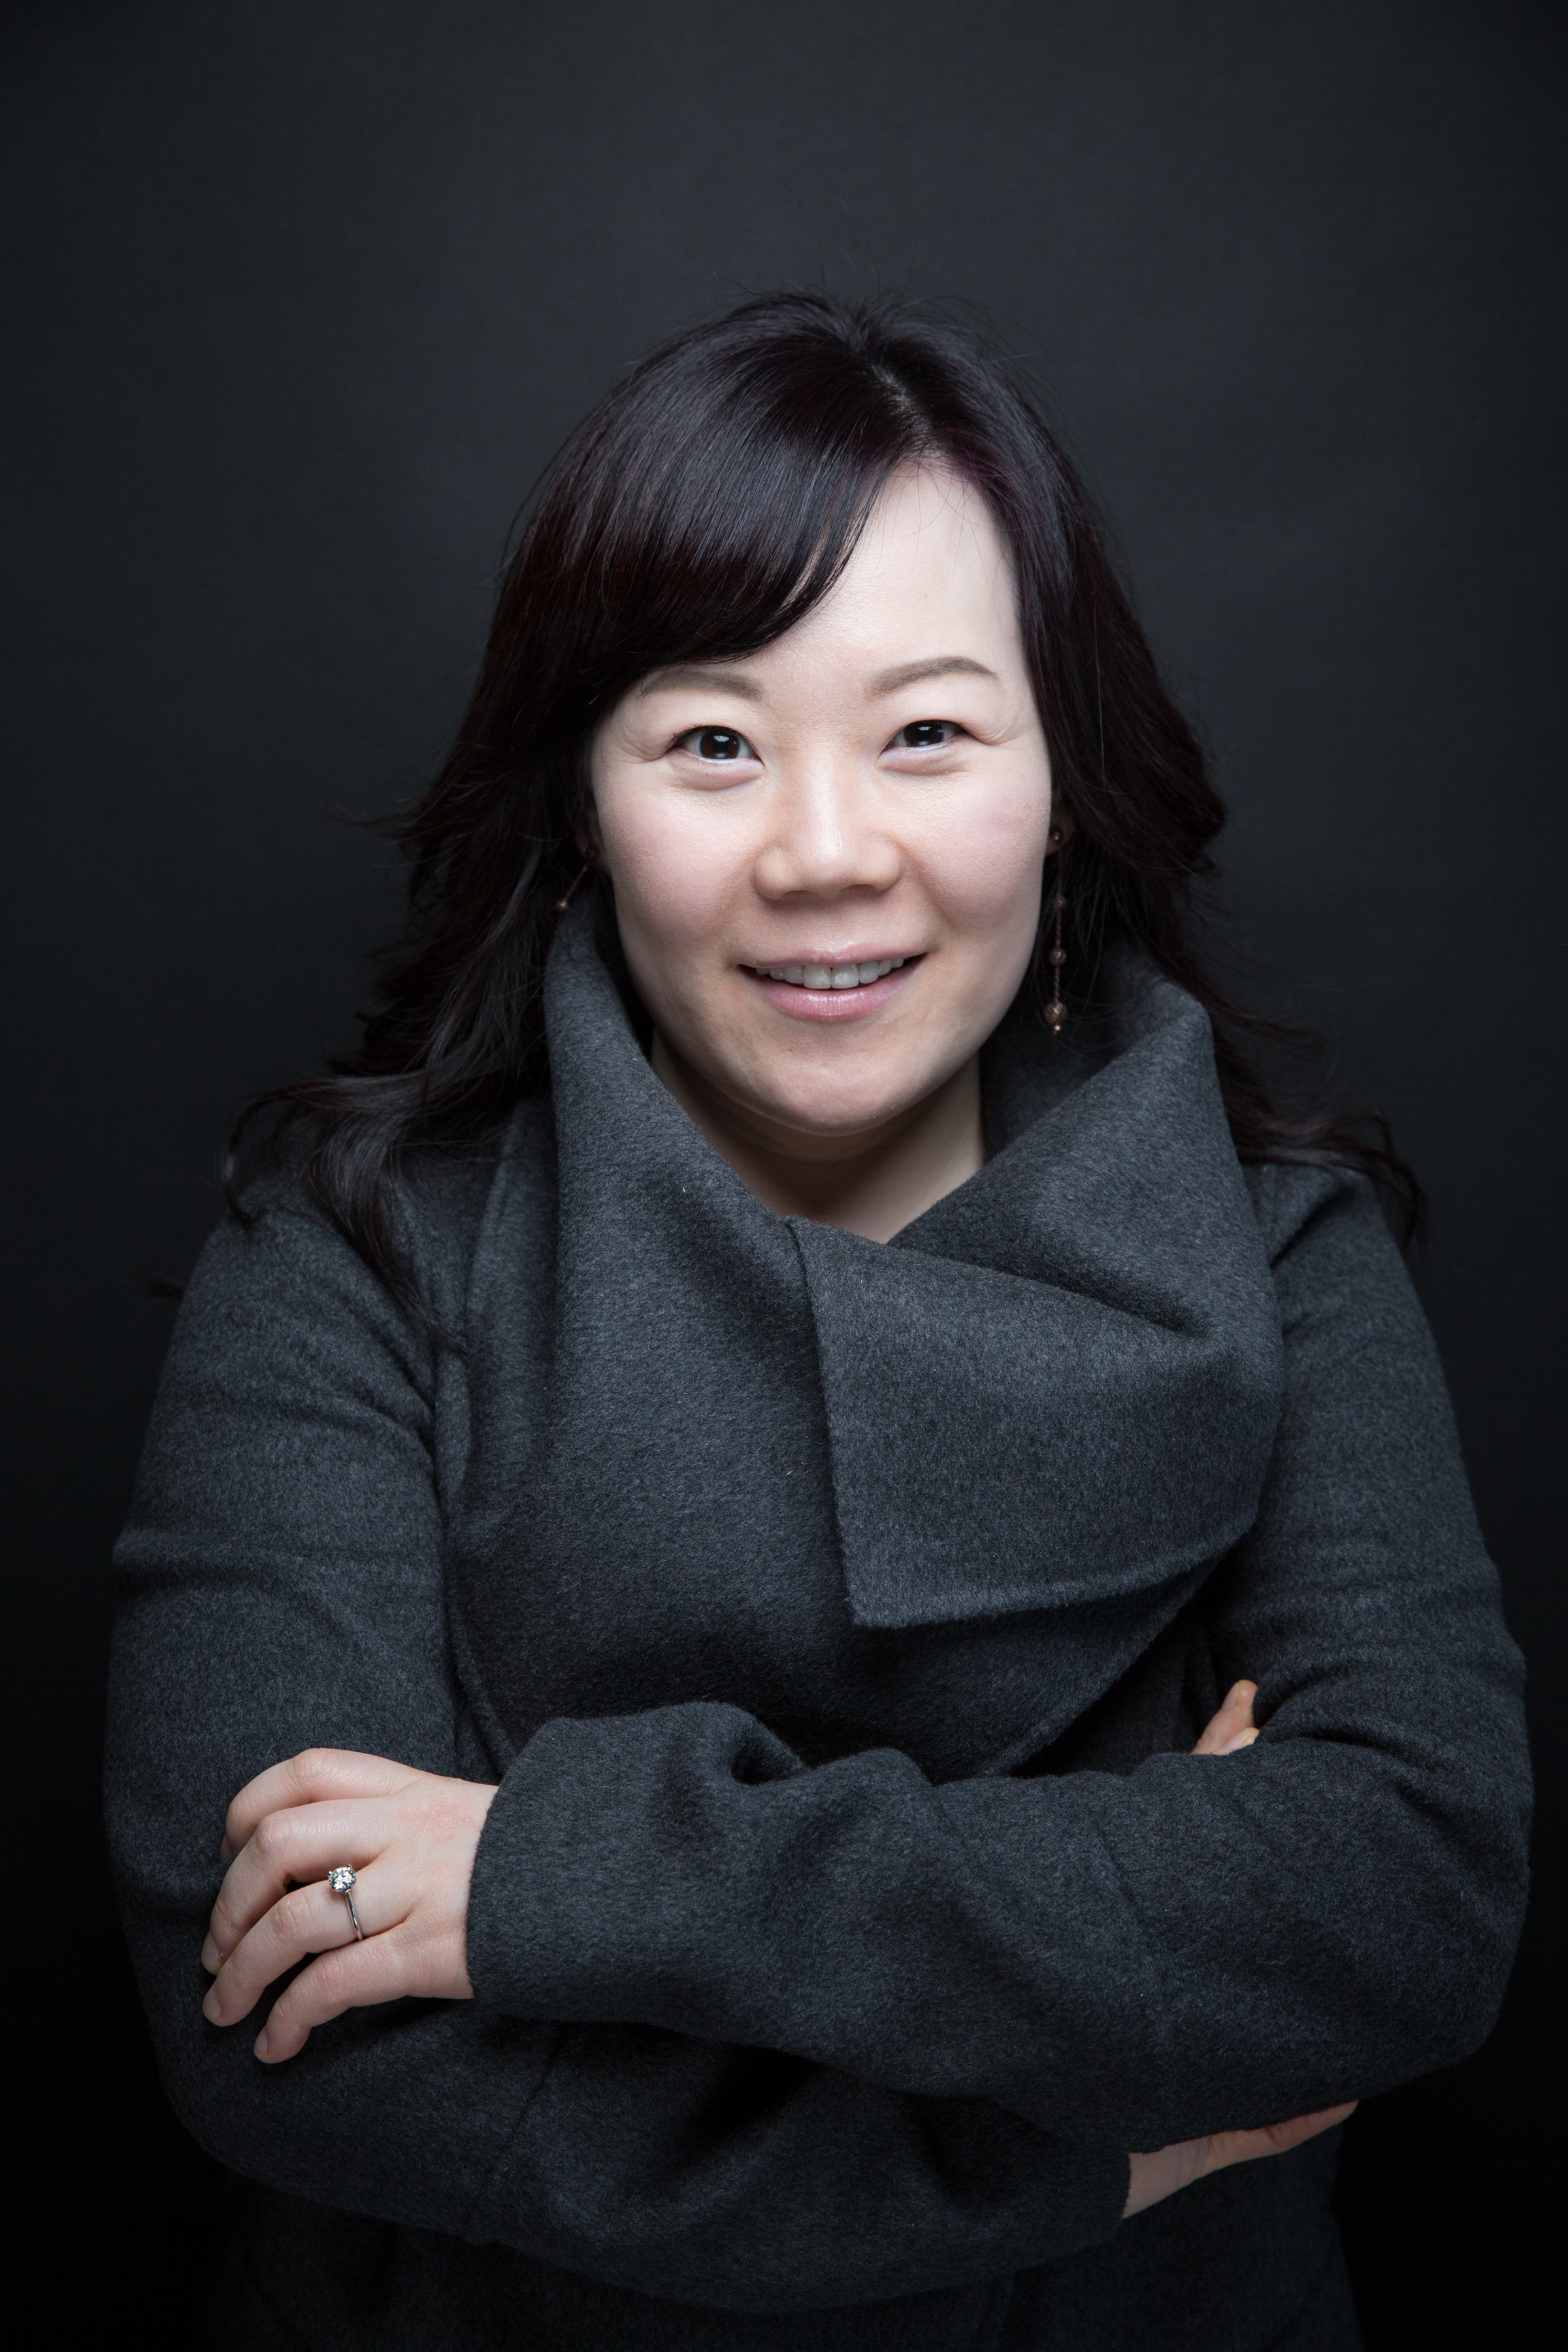 Soojin Oh Park